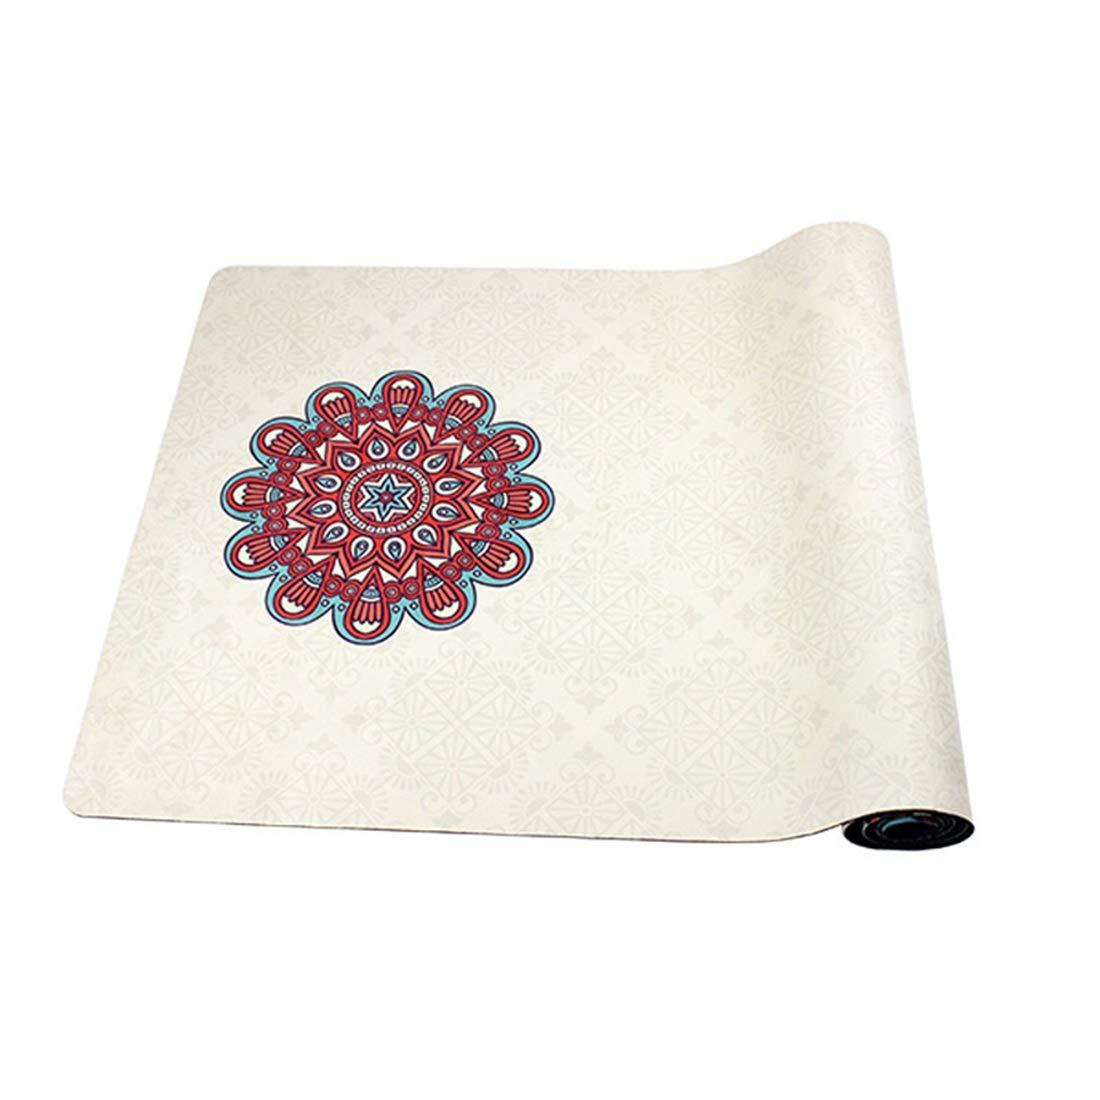 brand new 5eec7 02859 ... FELICIGG Stuoia di Yoga Mat 1,5 mm mm mm Ecologico Delicious Fitness  Mat Mat ...